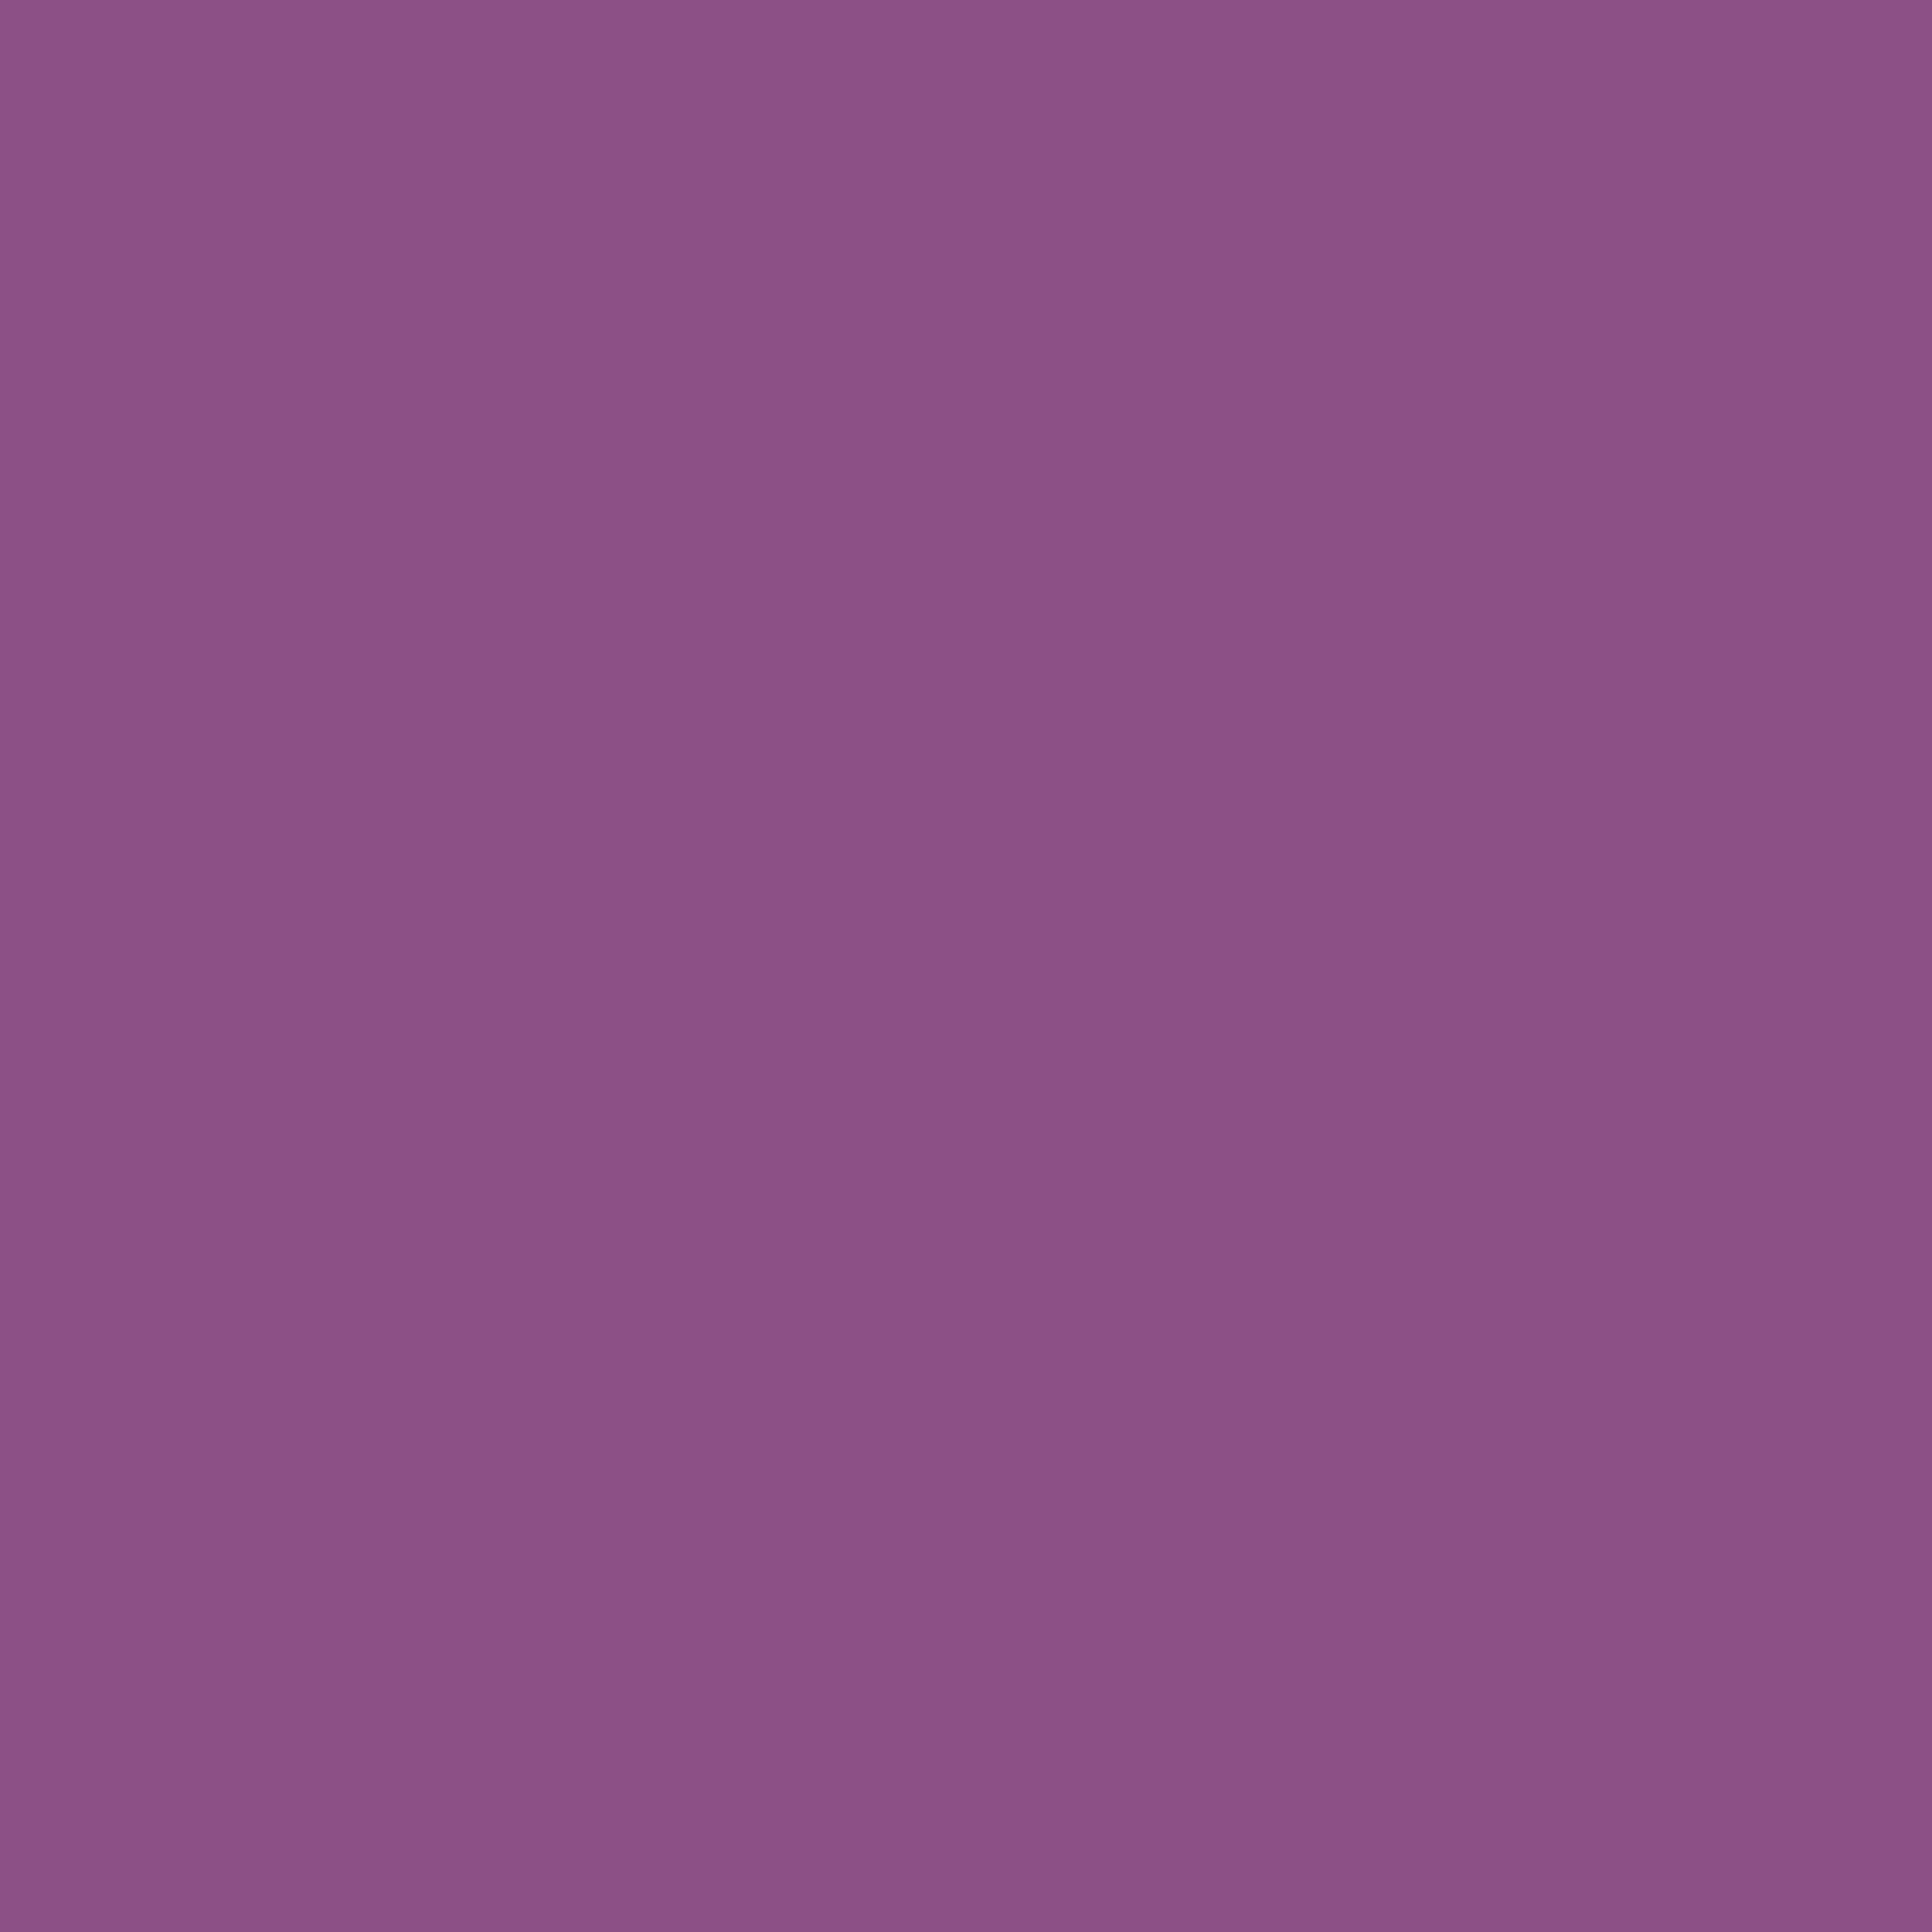 2732x2732 Razzmic Berry Solid Color Background